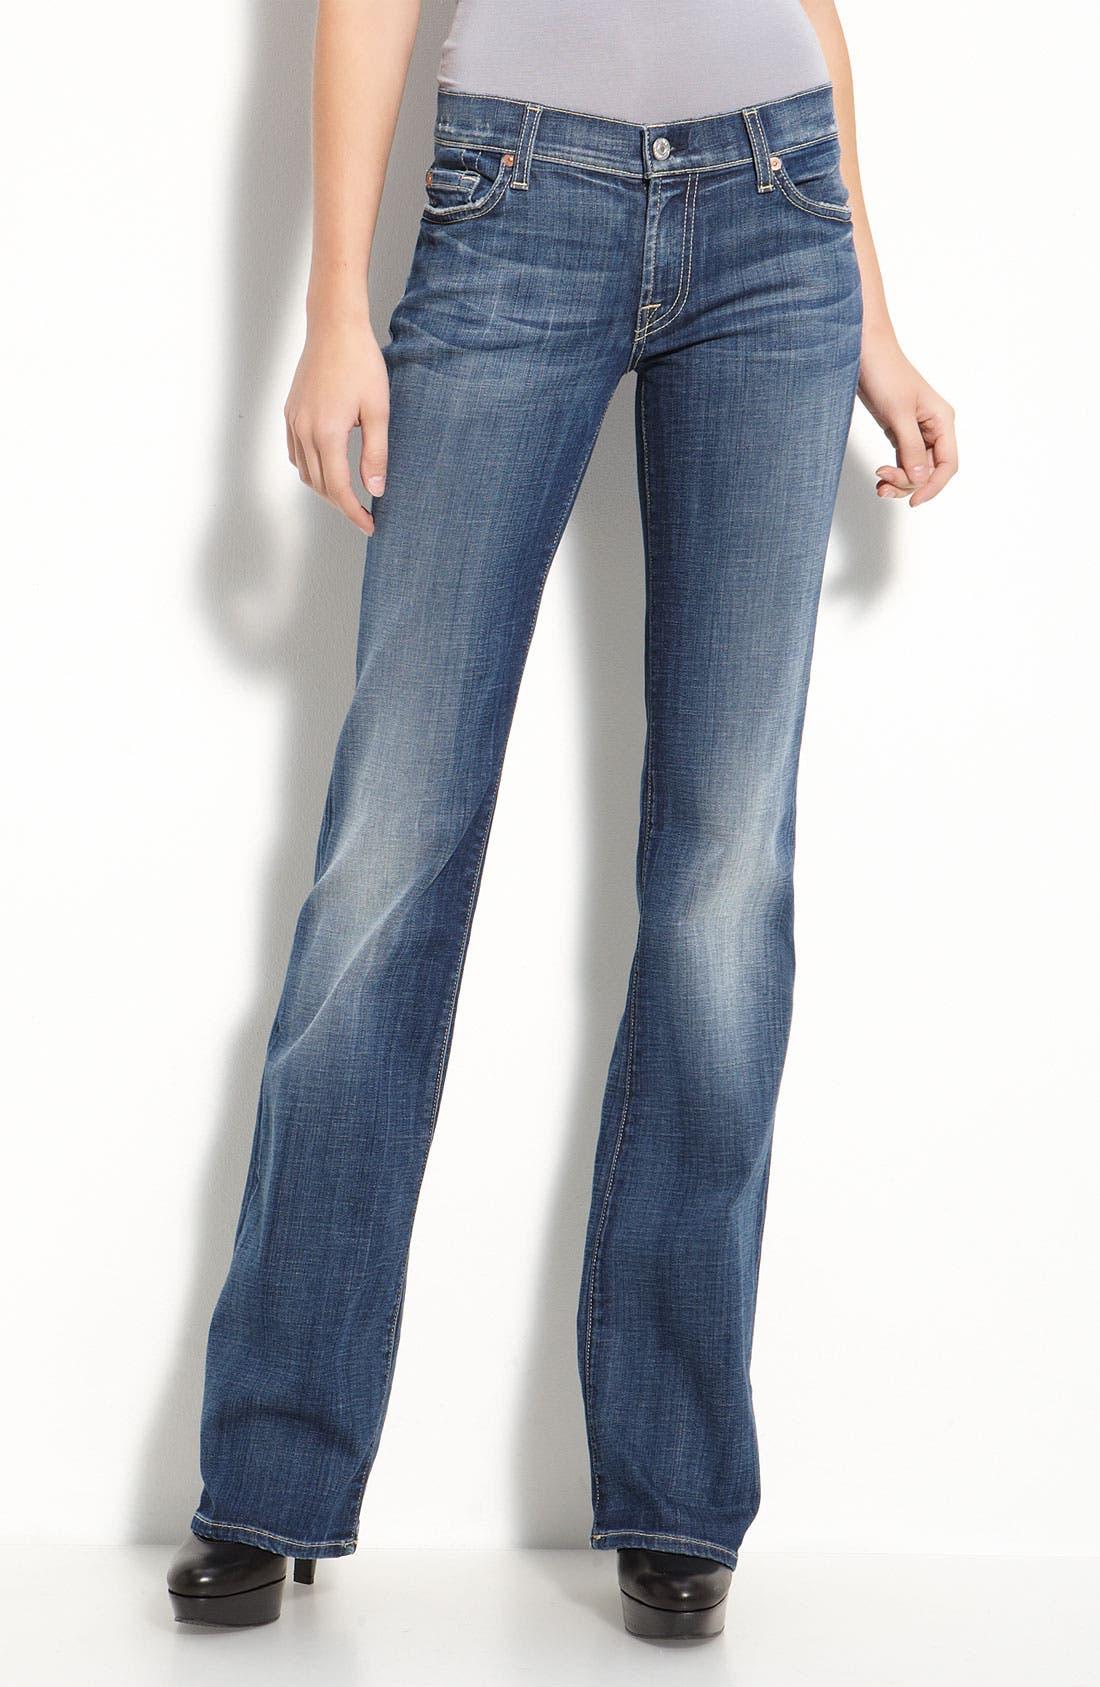 Alternate Image 1 Selected - 7 For All Mankind® Stretch Denim Bootcut Jeans (Vintage Flash Wash)